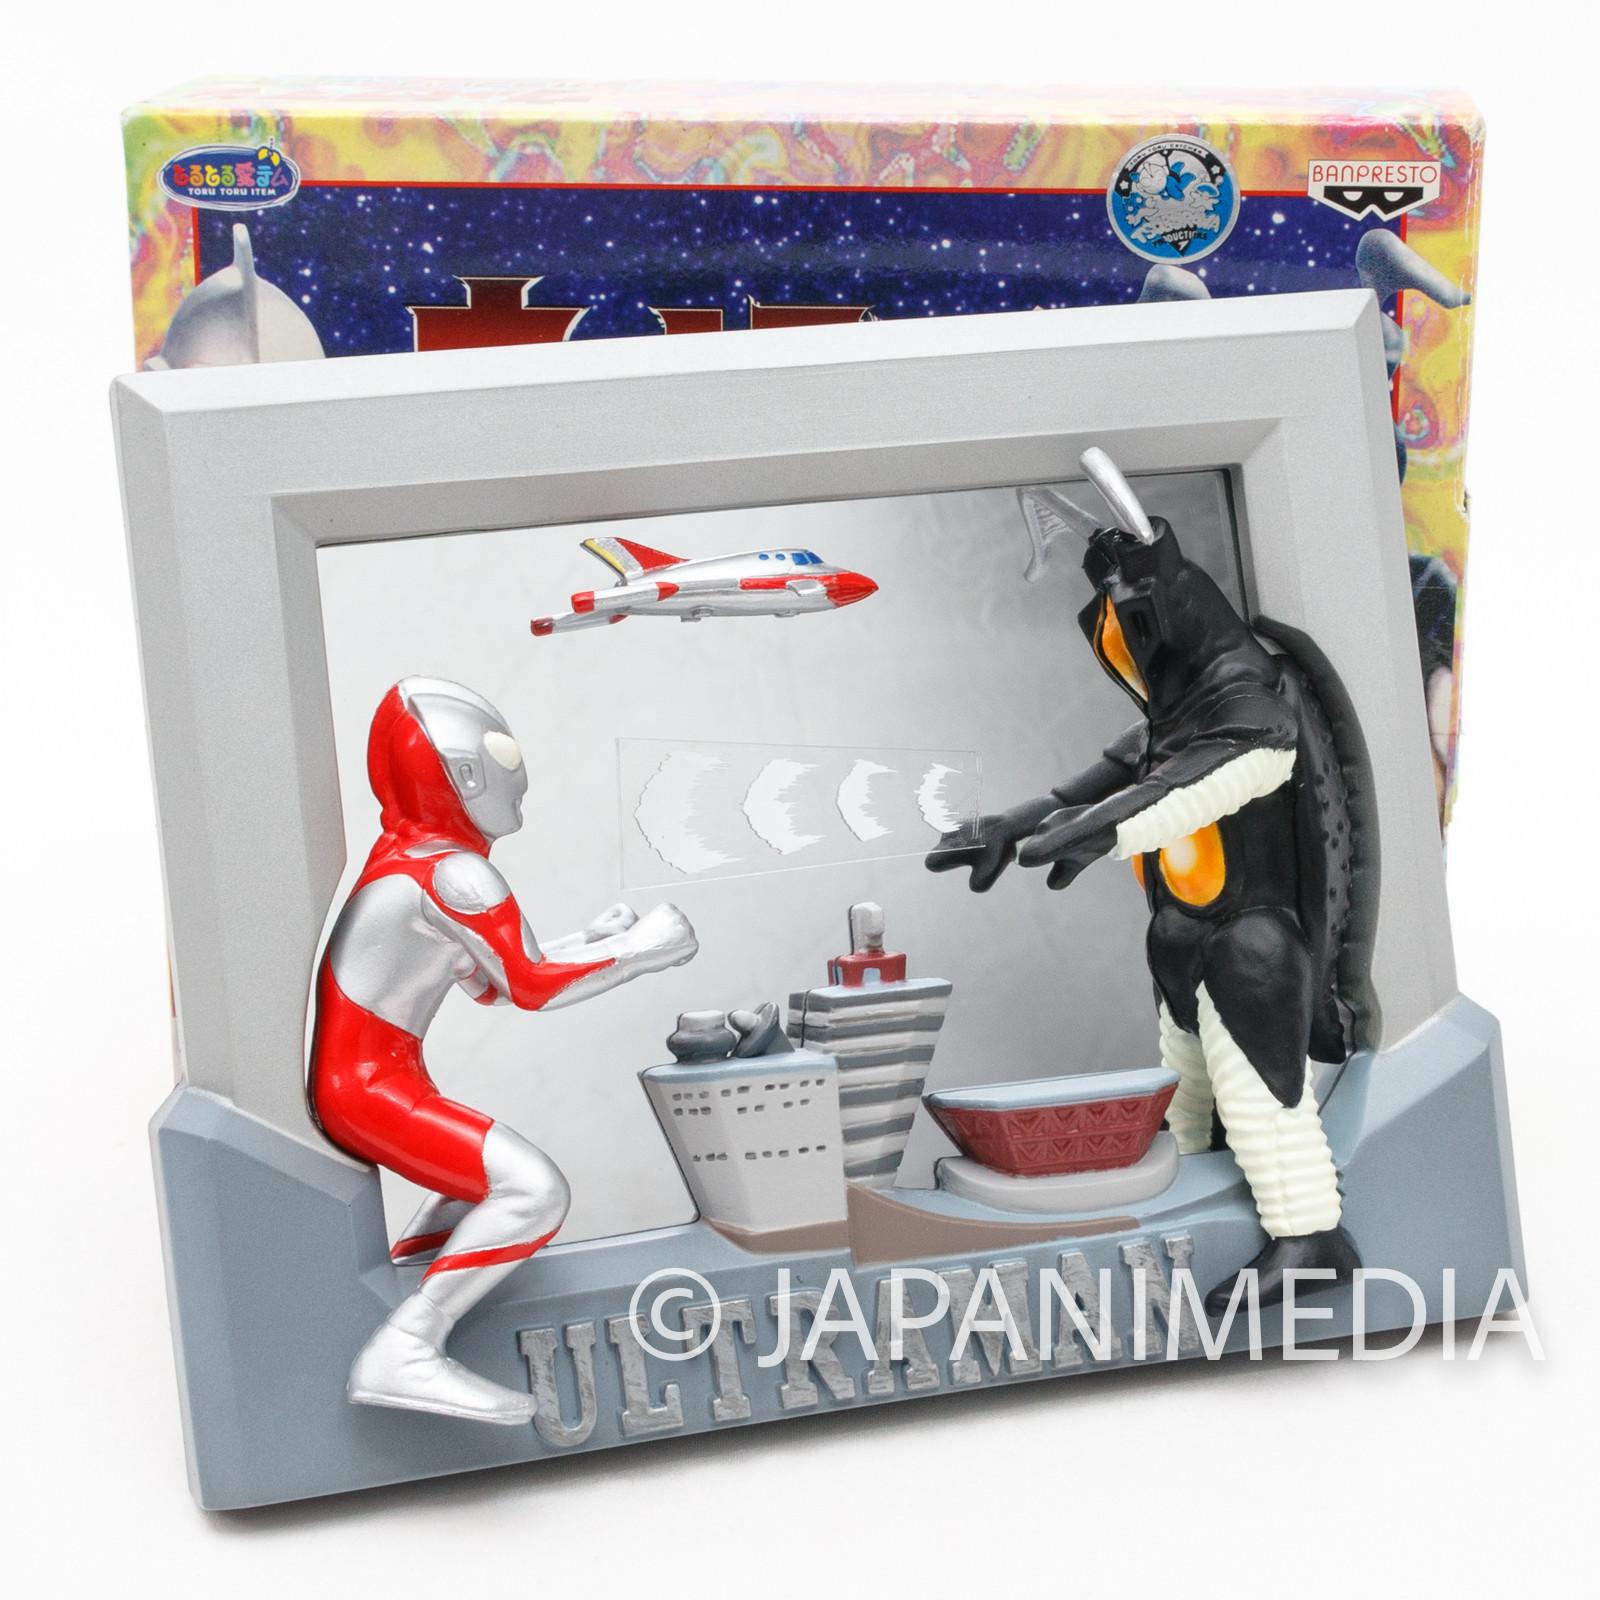 Ultraman Diorama Relief Mirror Zetton Banpresto JAPAN ANIME TOKUSATSU